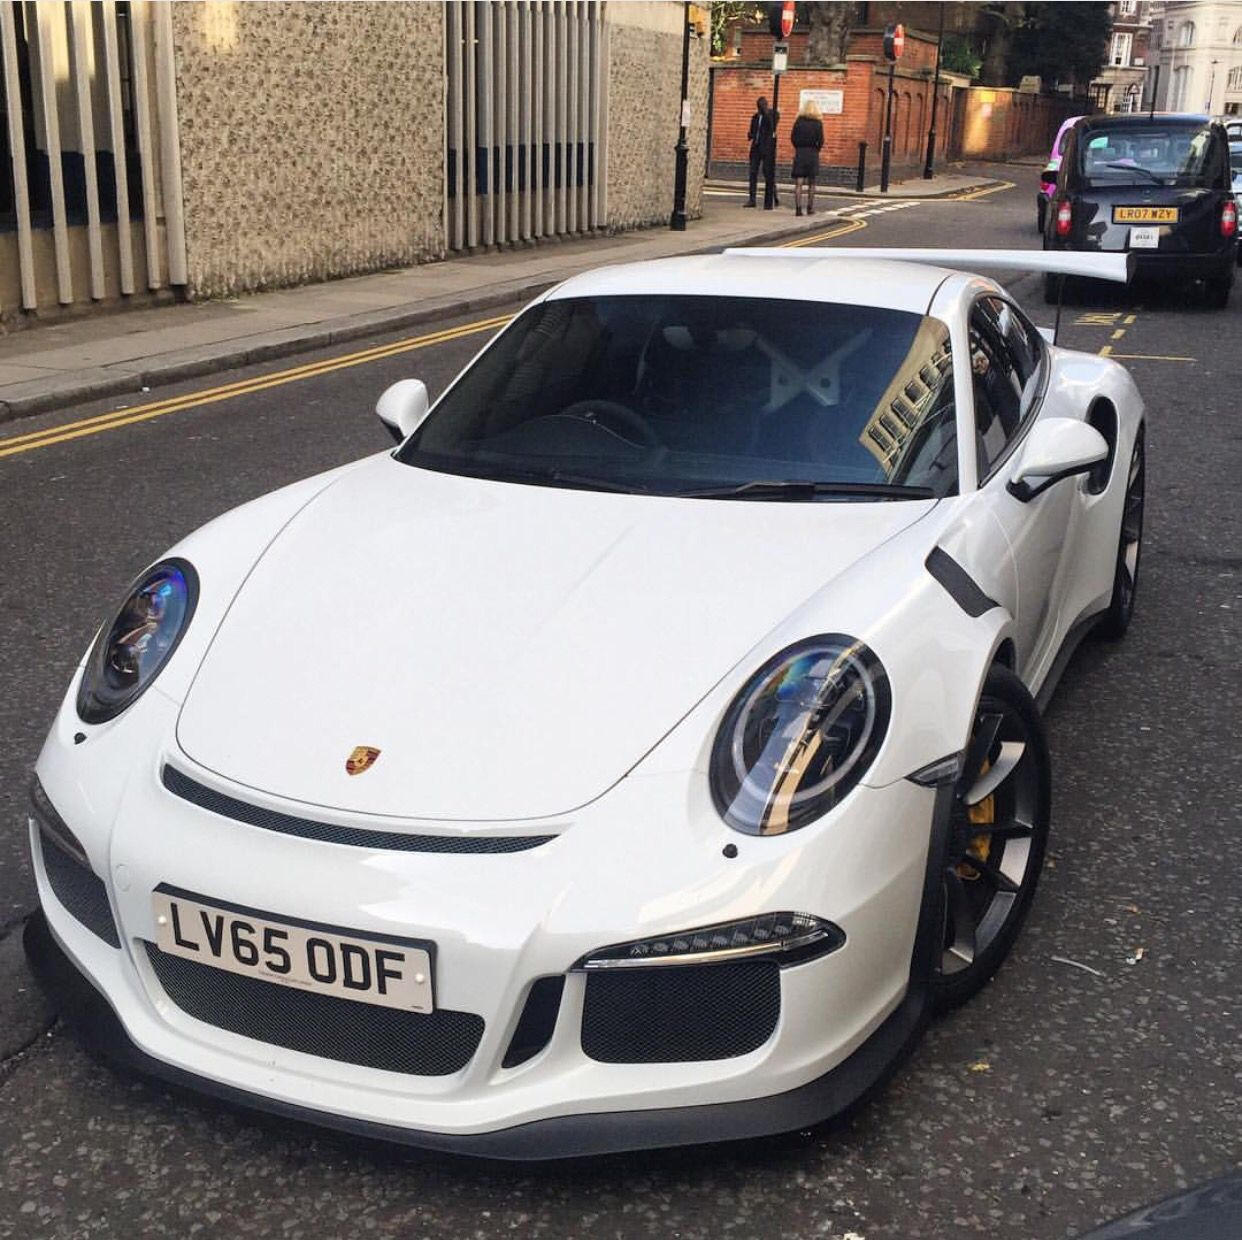 Porsche 991 GT3 RS painted in White Photo taken by: @henryjmw on Instagram